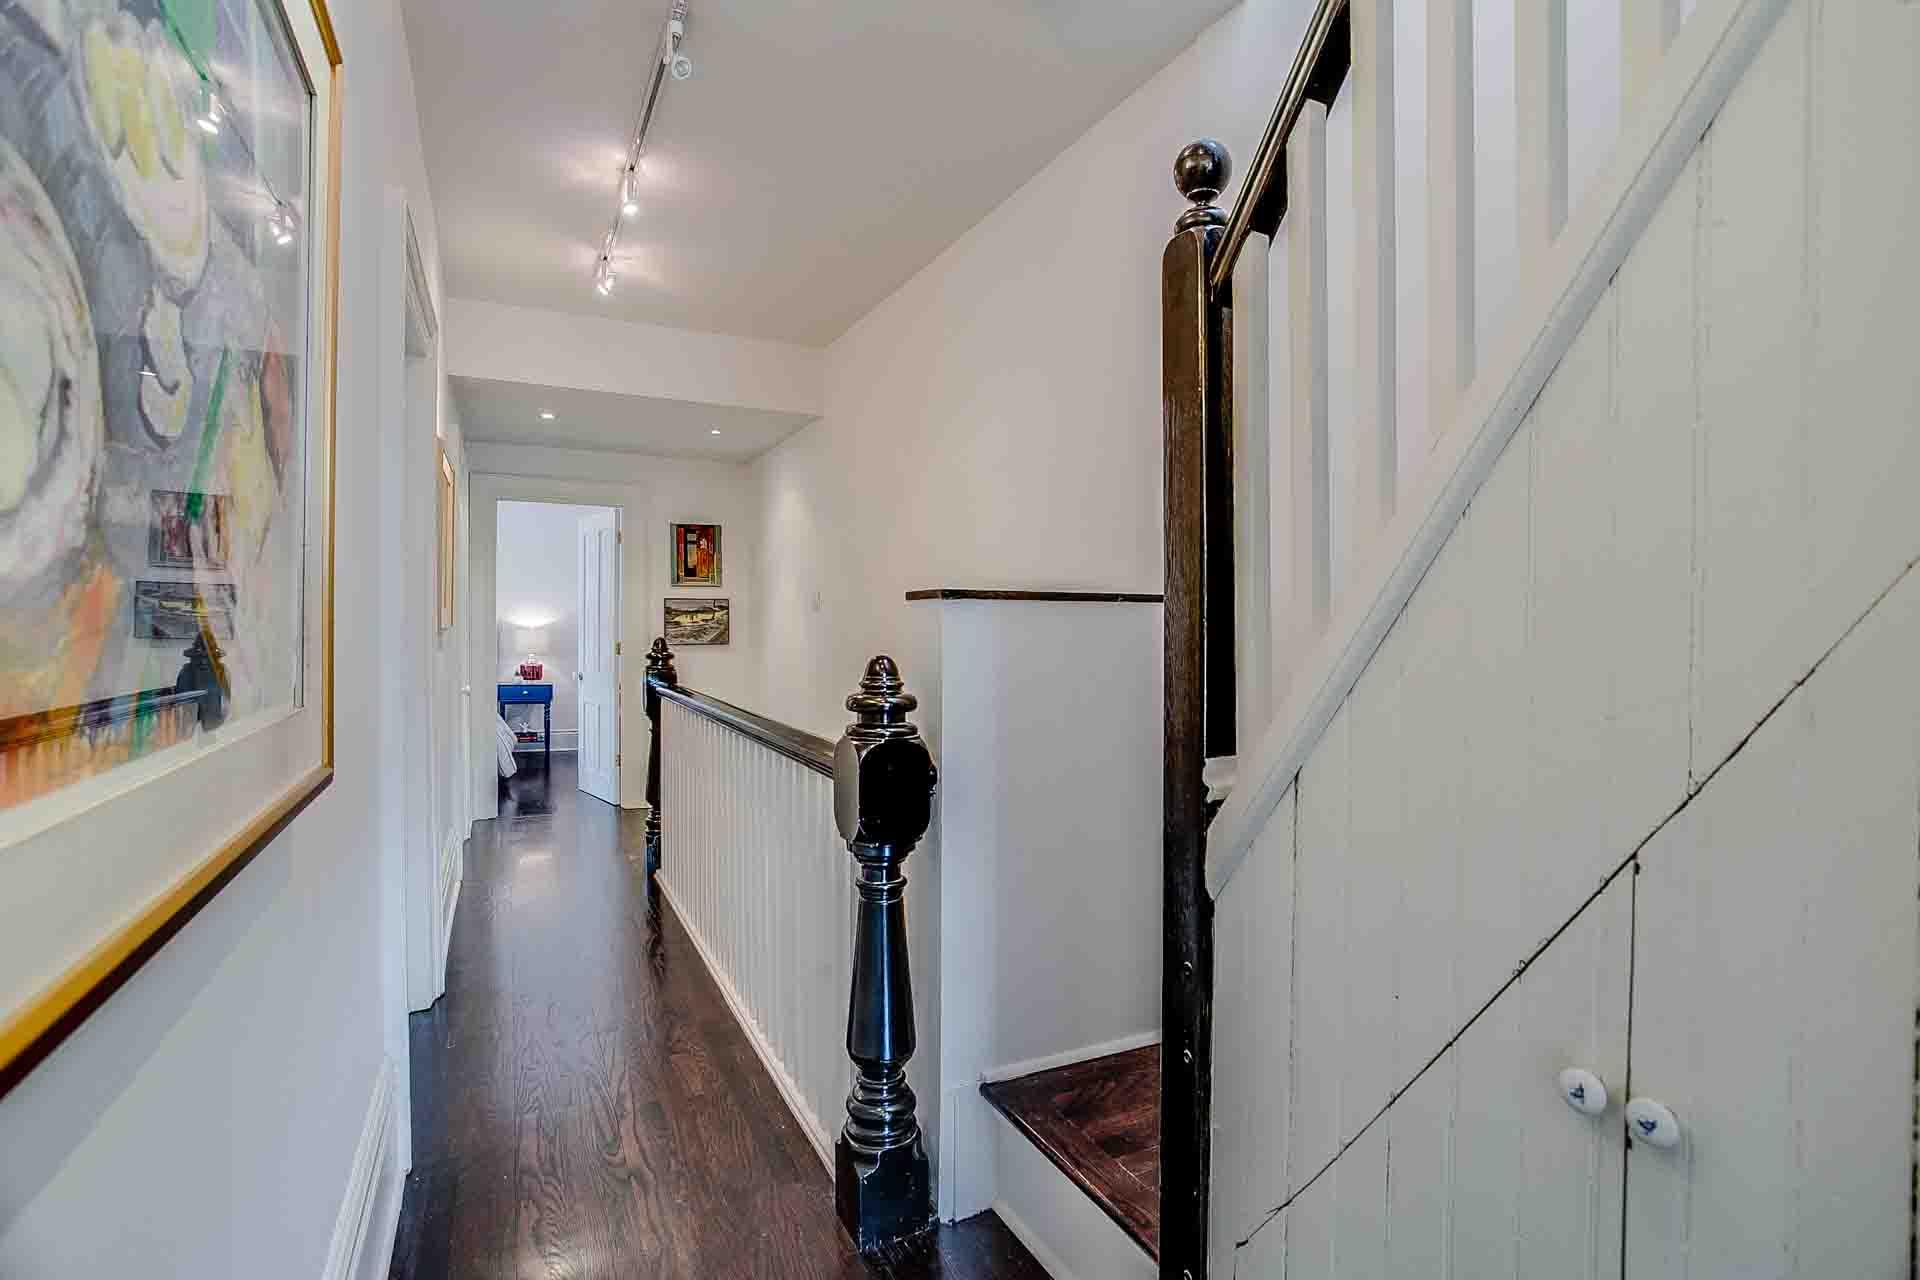 25_upper_hallway_2